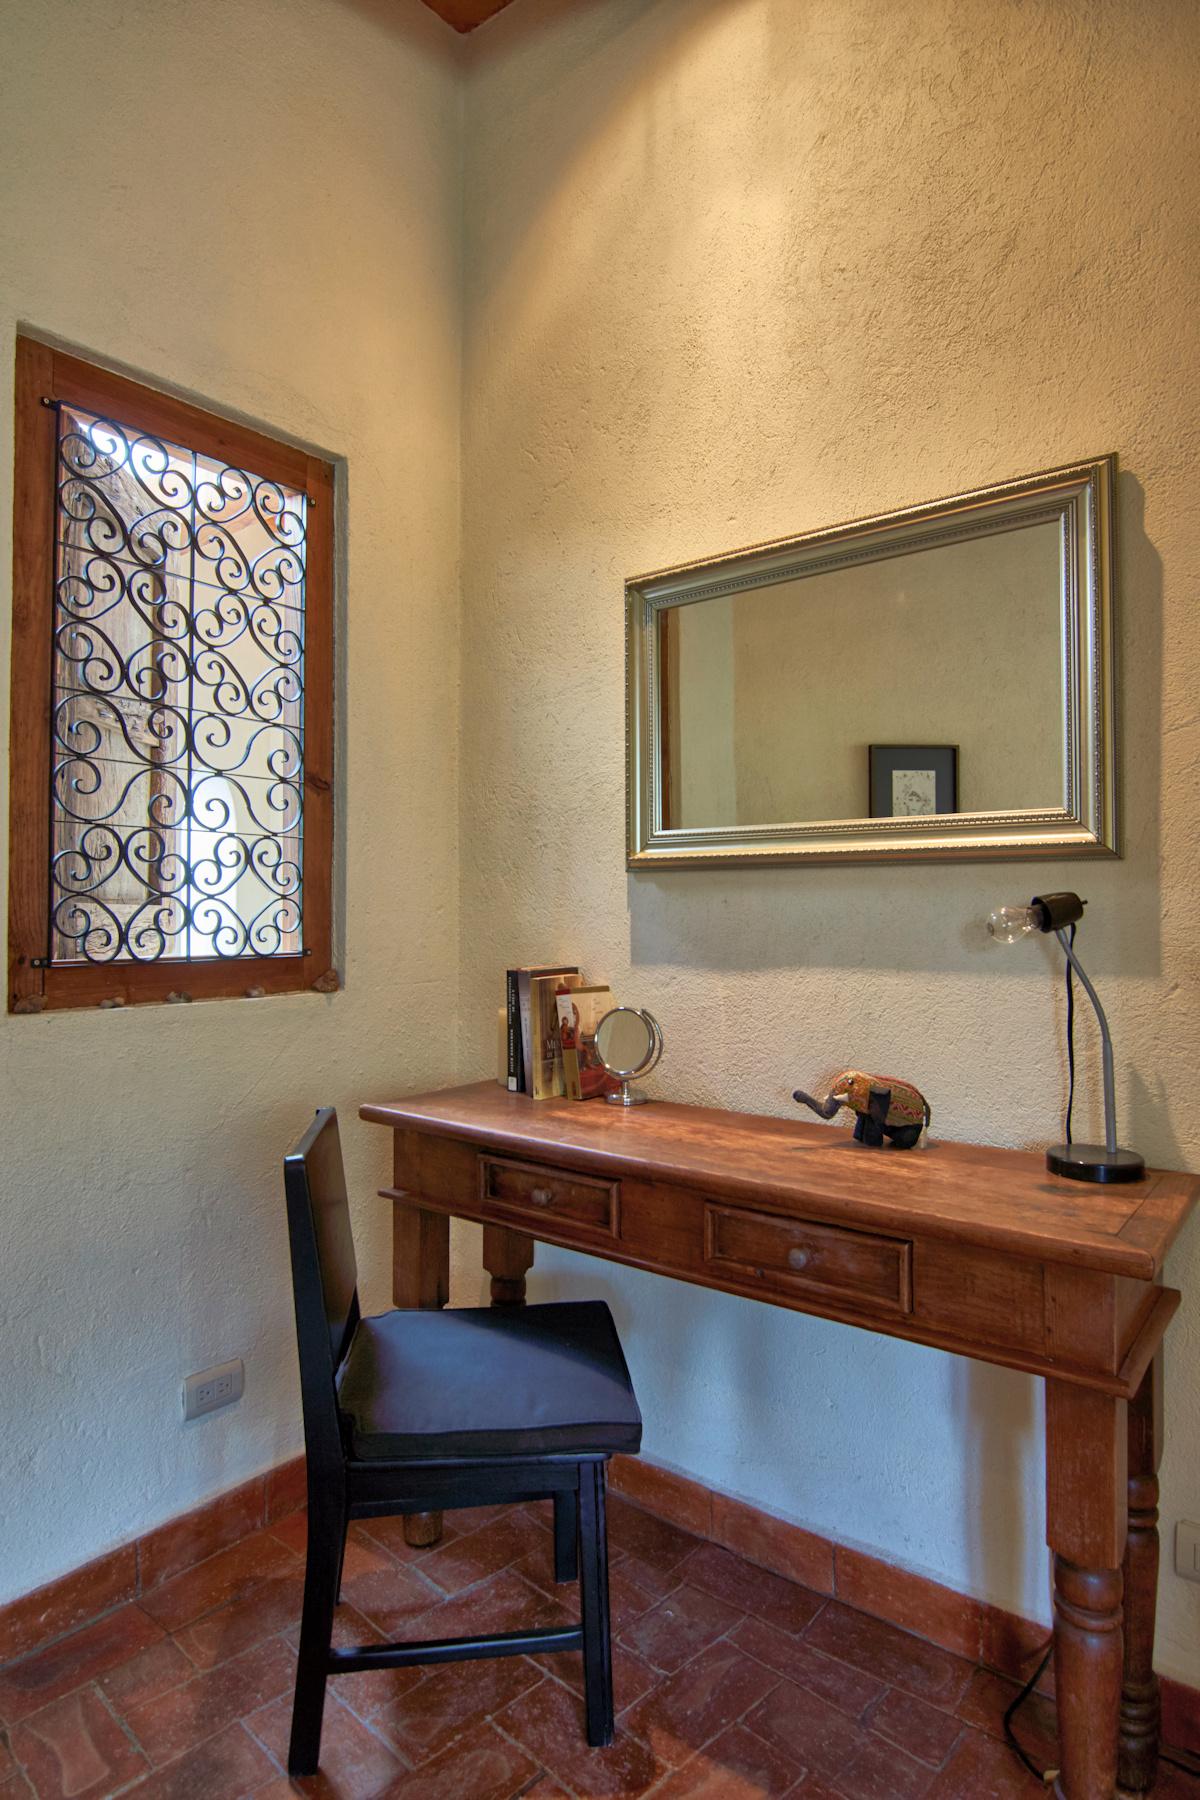 Additional photo for property listing at Casa Panorama Ojo de Agua 19 San Miguel De Allende, Guanajuato 37777 Mexico